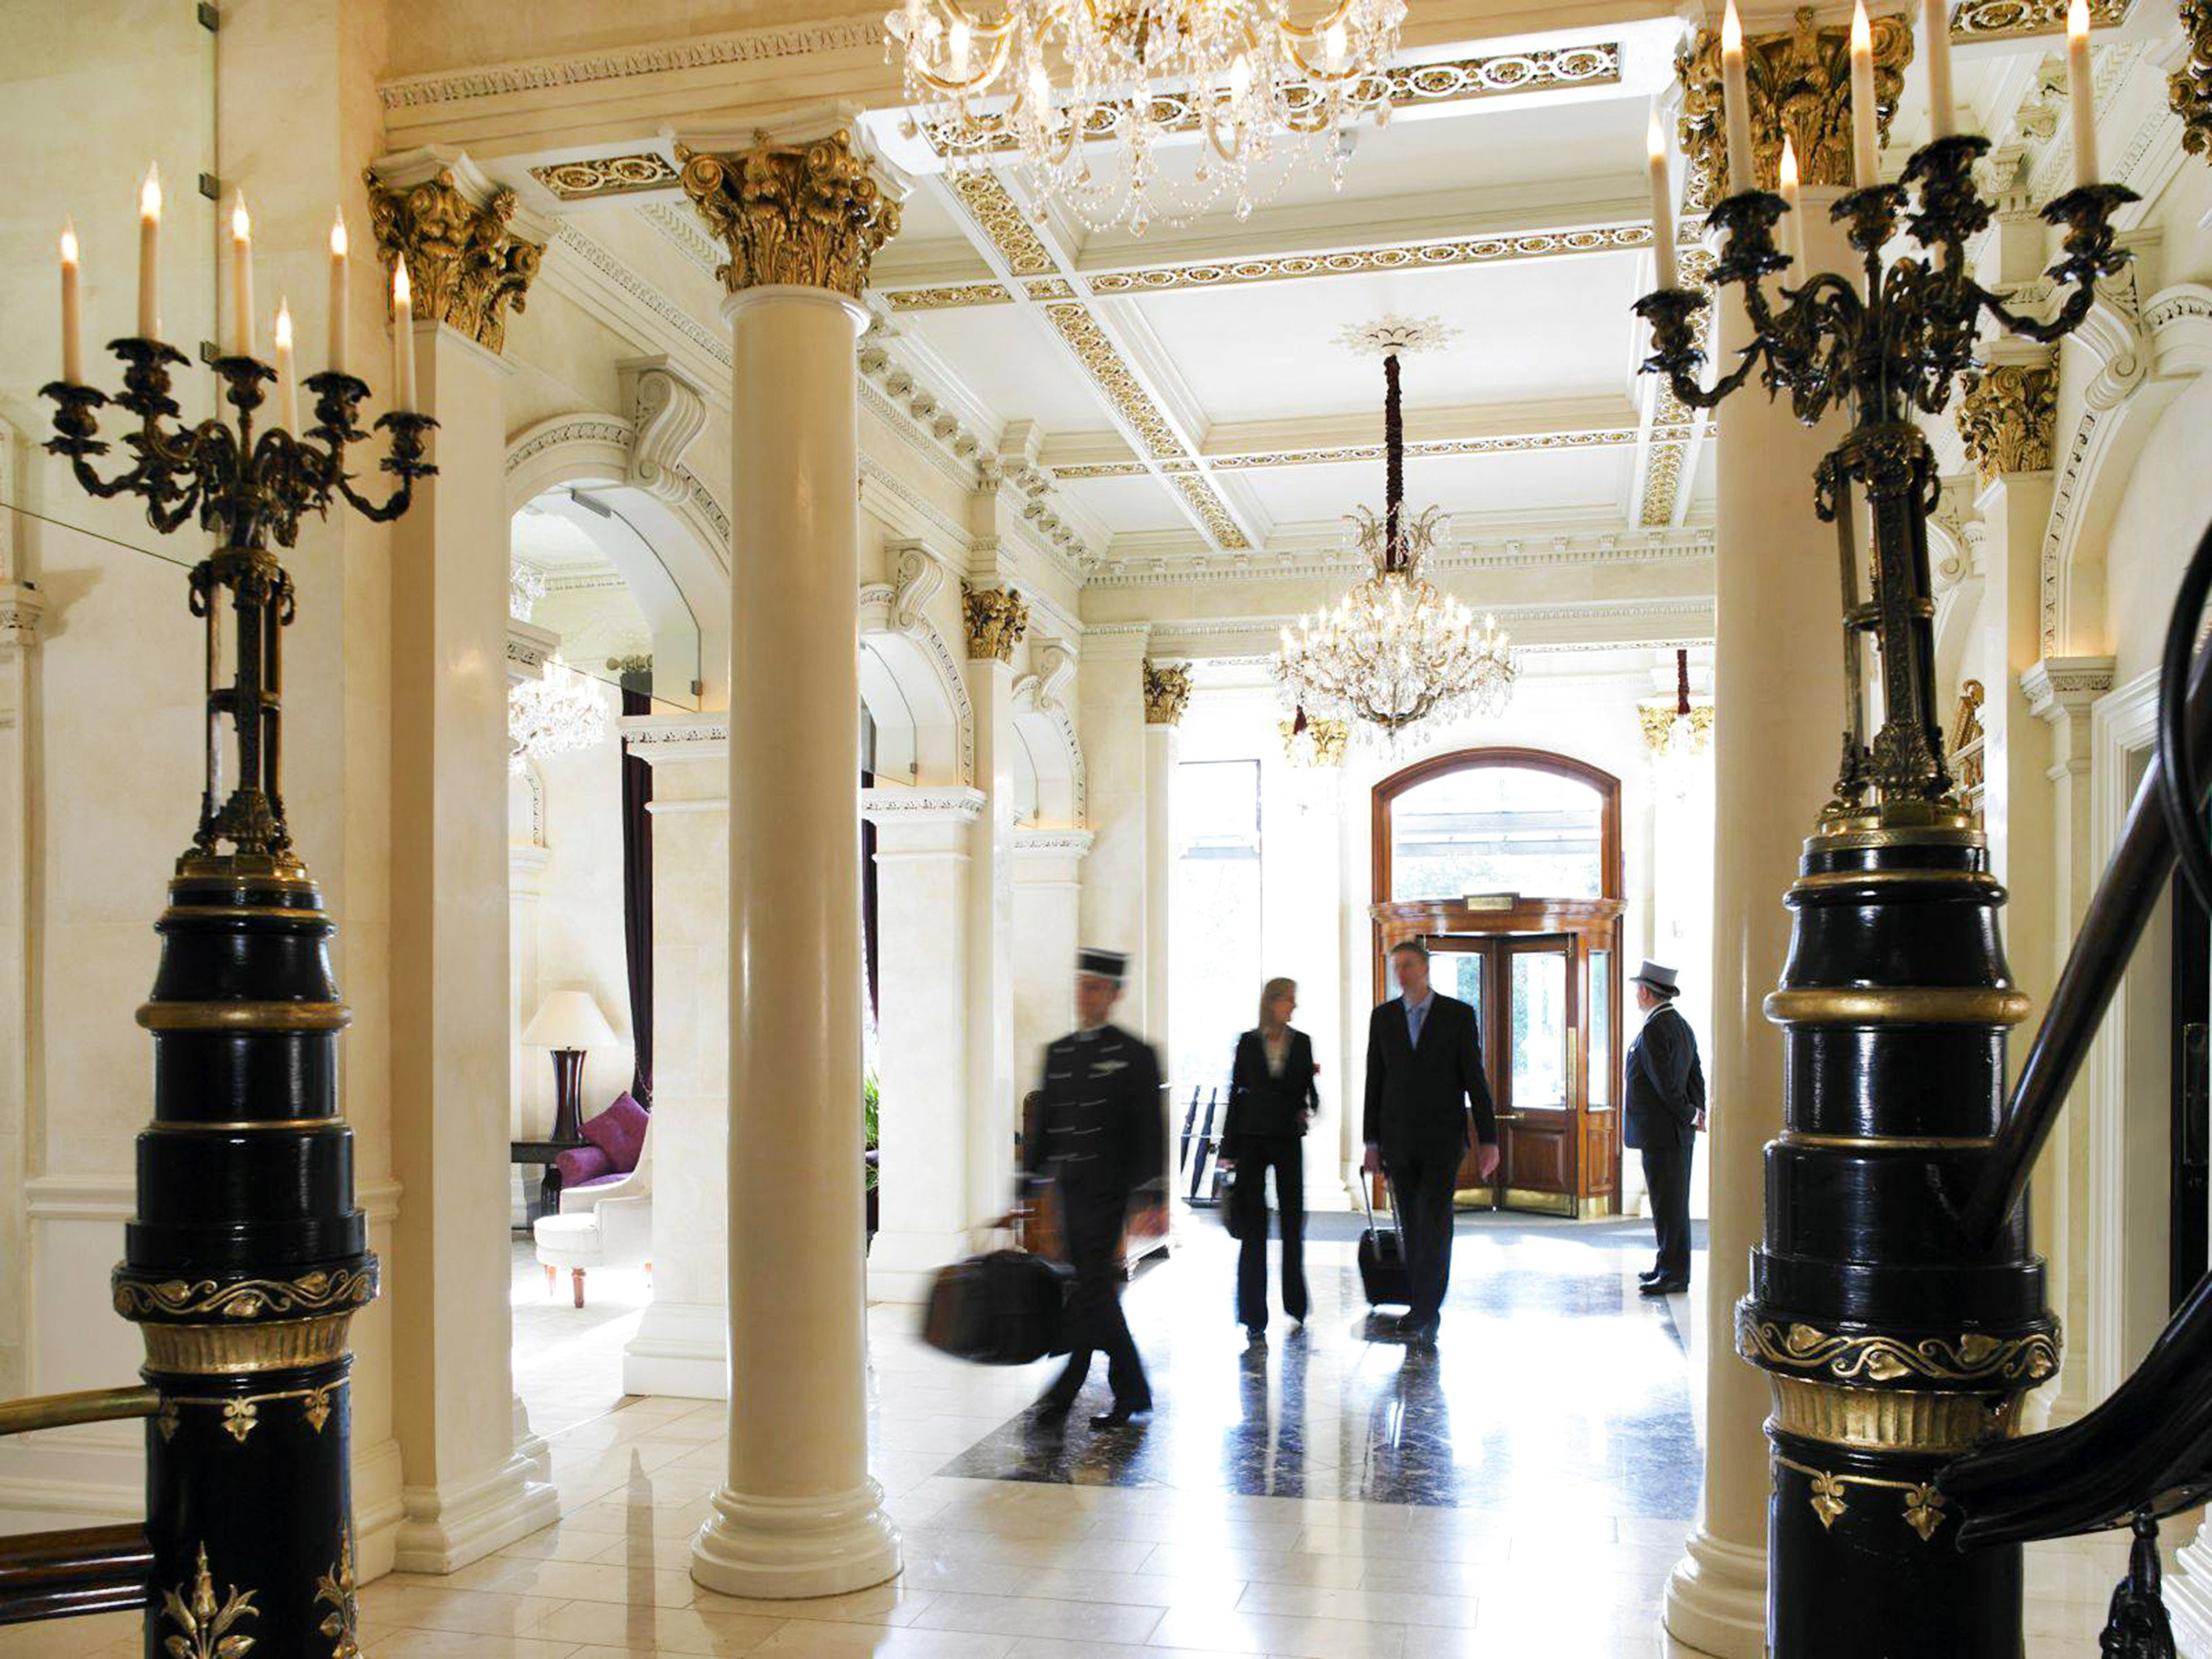 Classic Elegant Lobby Luxury building aisle Boutique palace tourist attraction column hall museum retail arcade altar